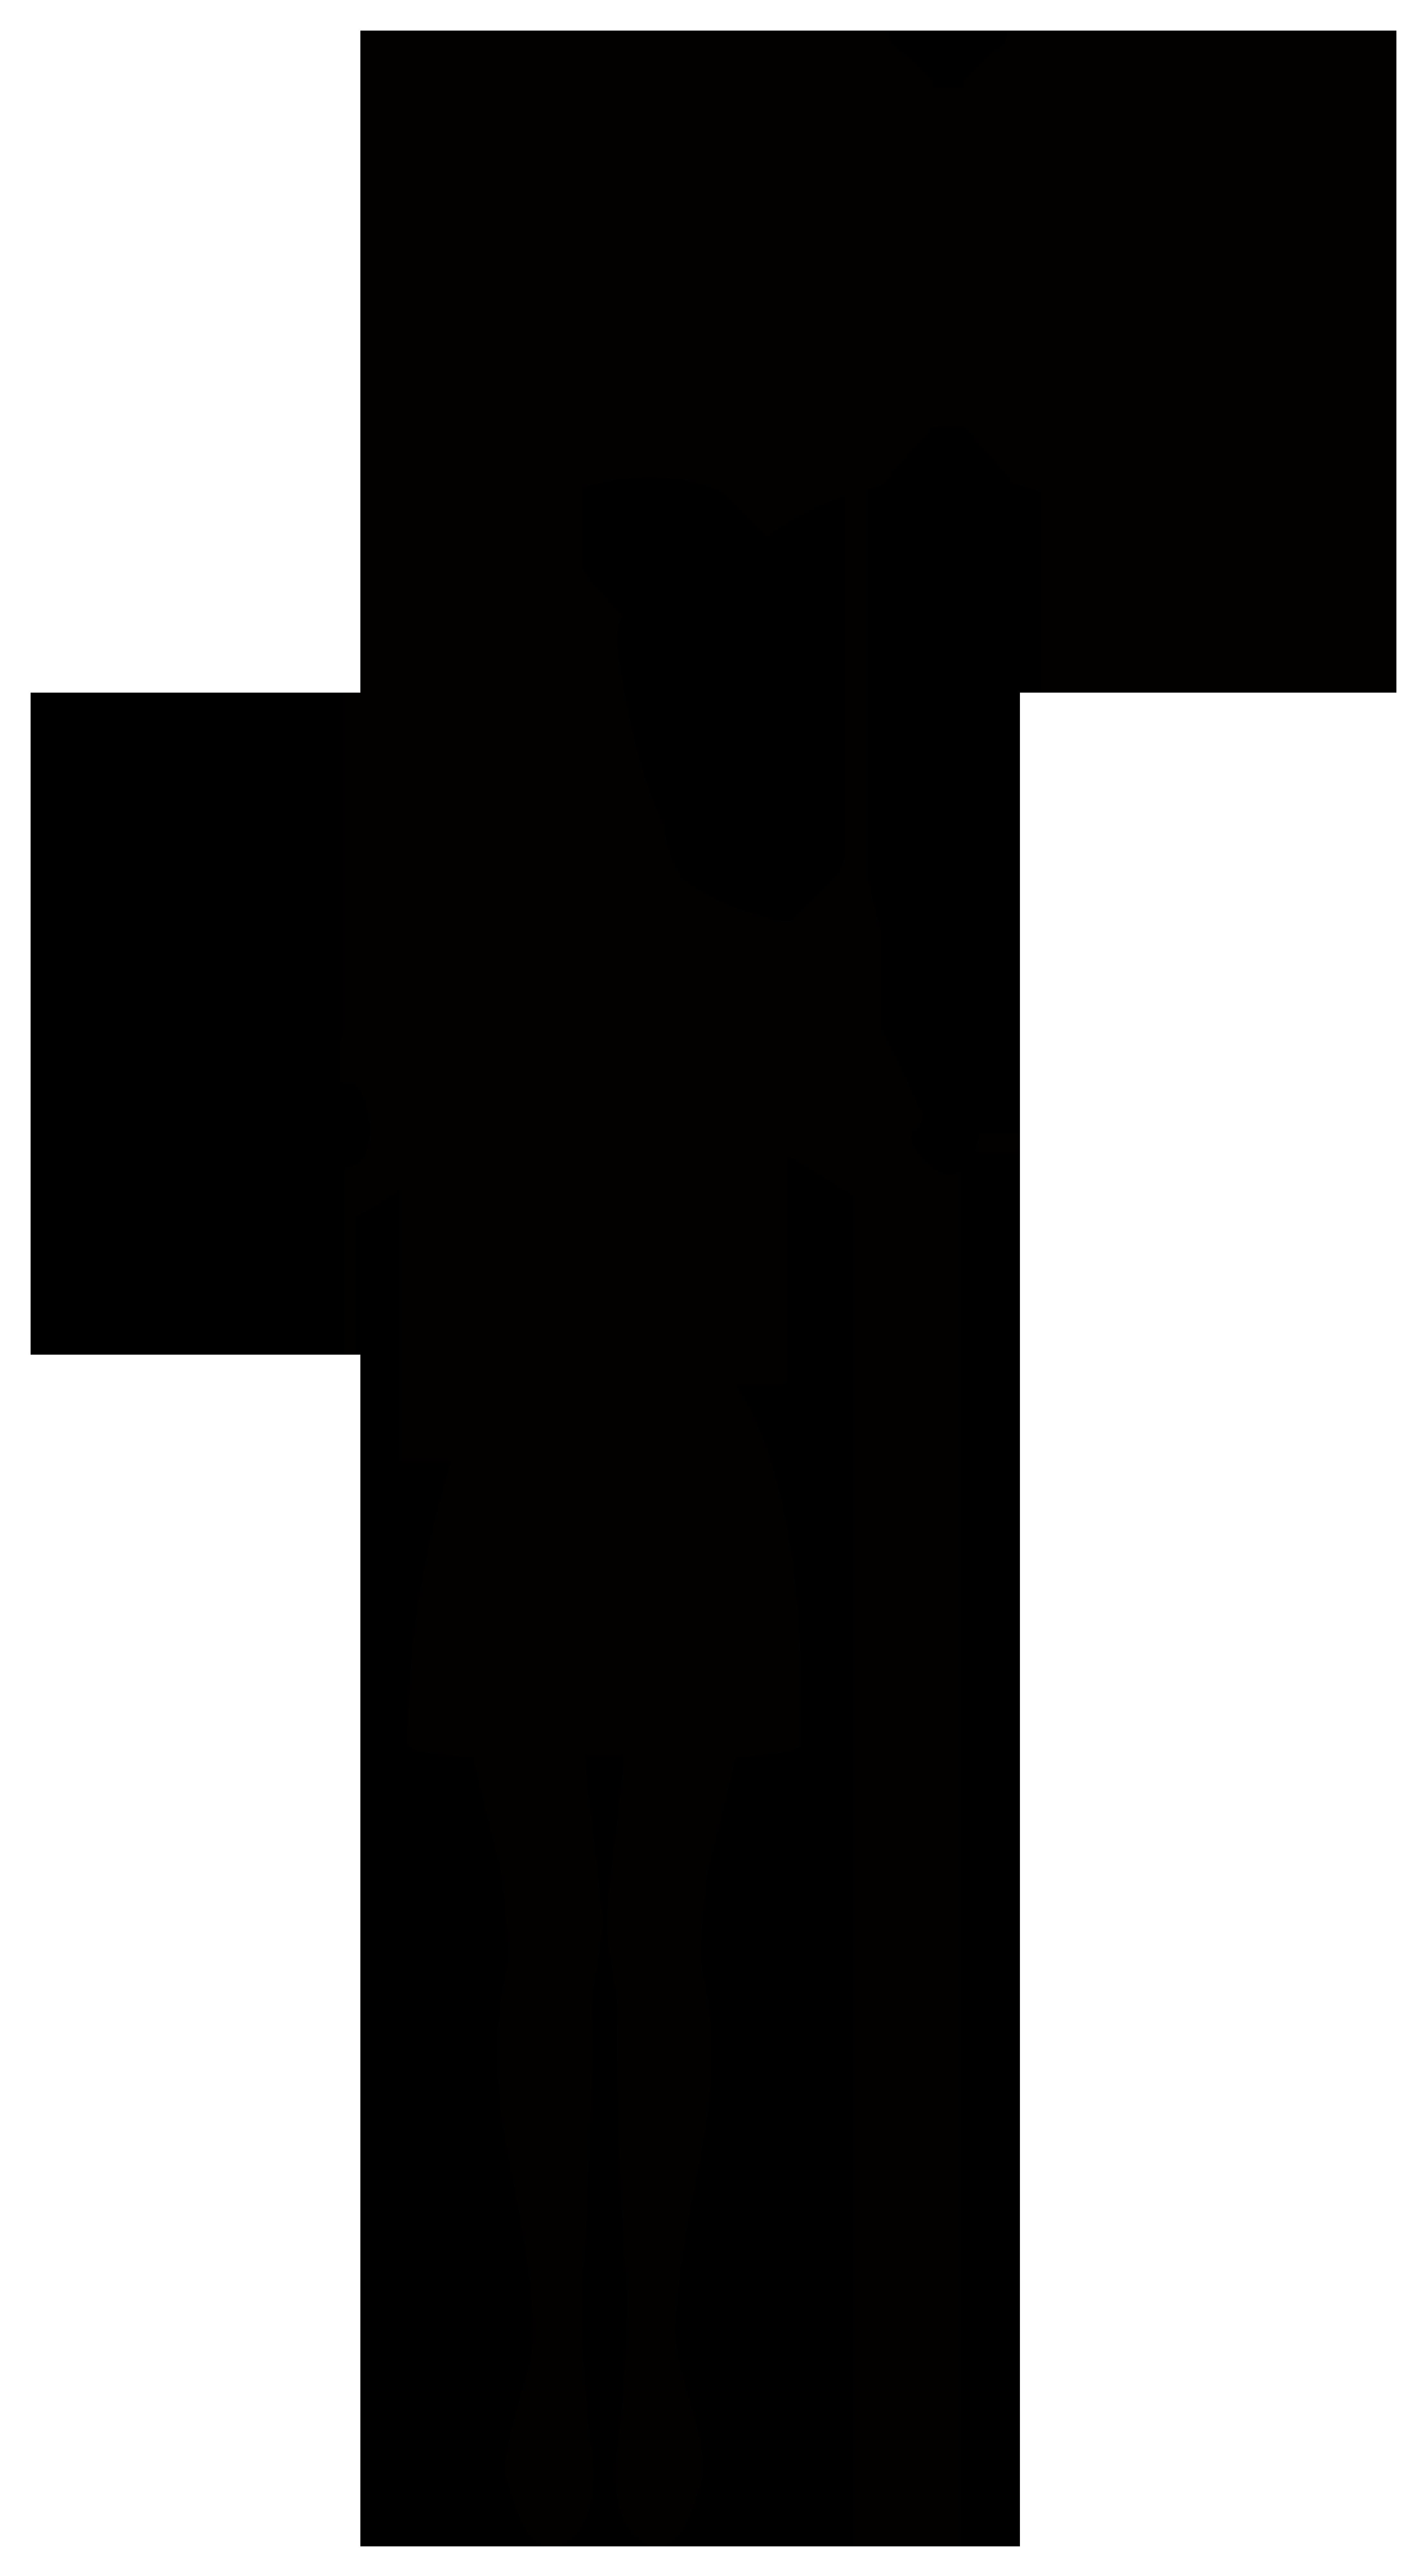 Girl clipart photographer. Umbrella silhouette stock photography